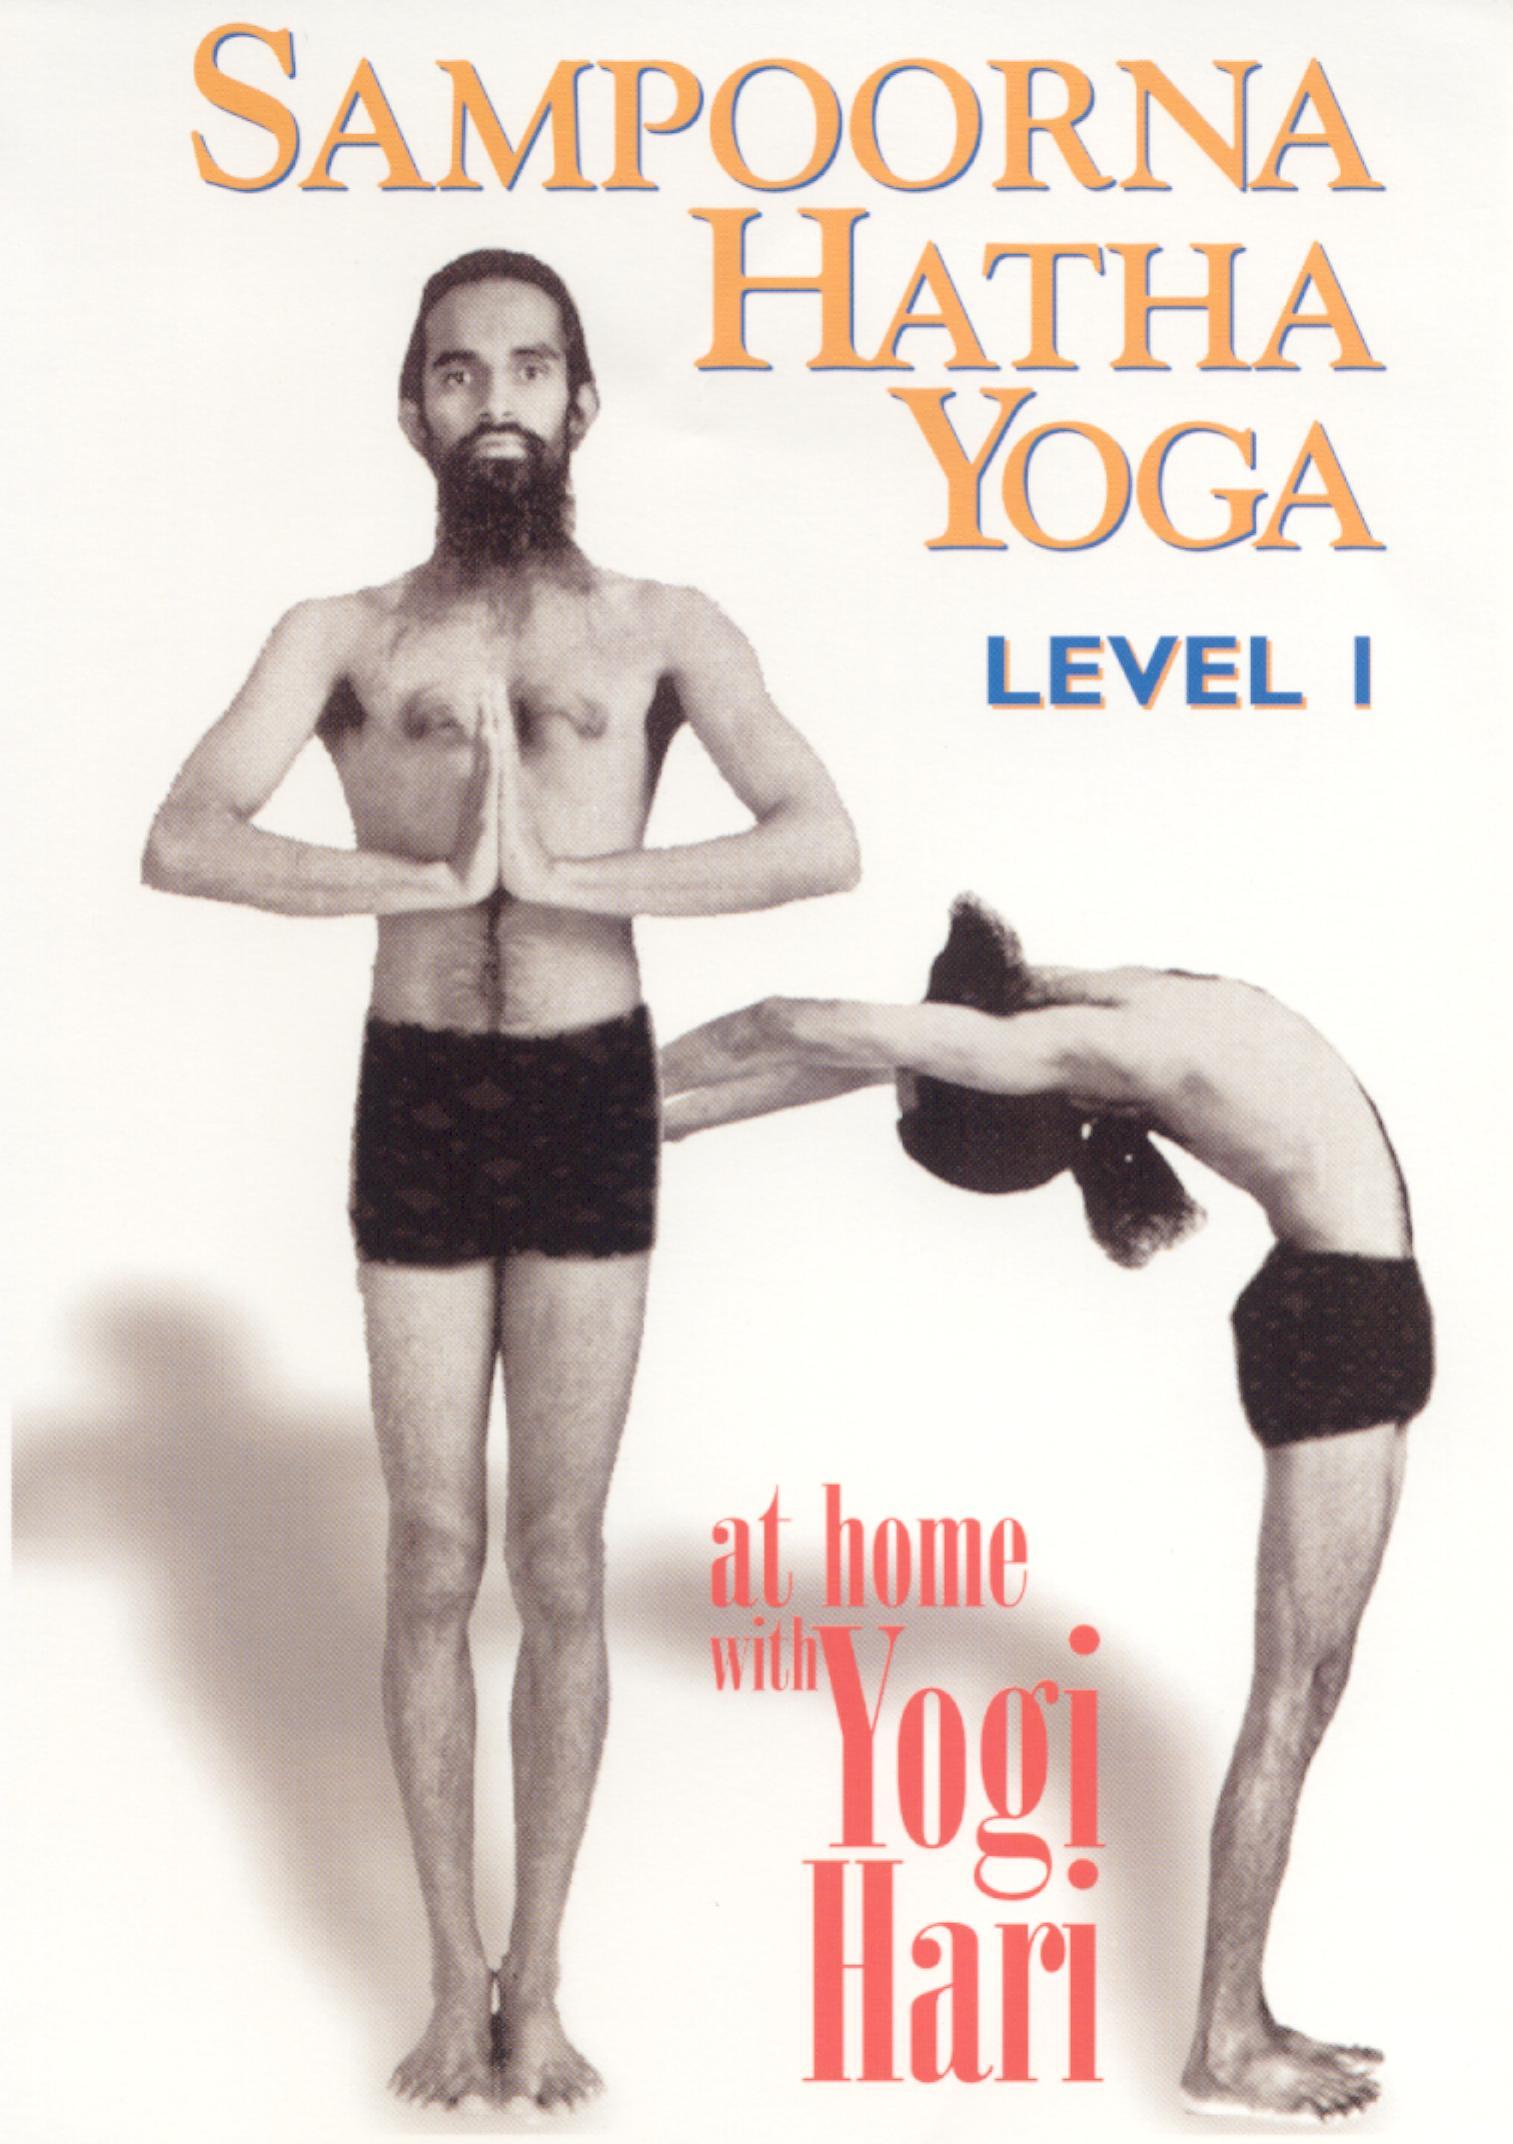 Sampoorna Hatha Yoga: Level 1